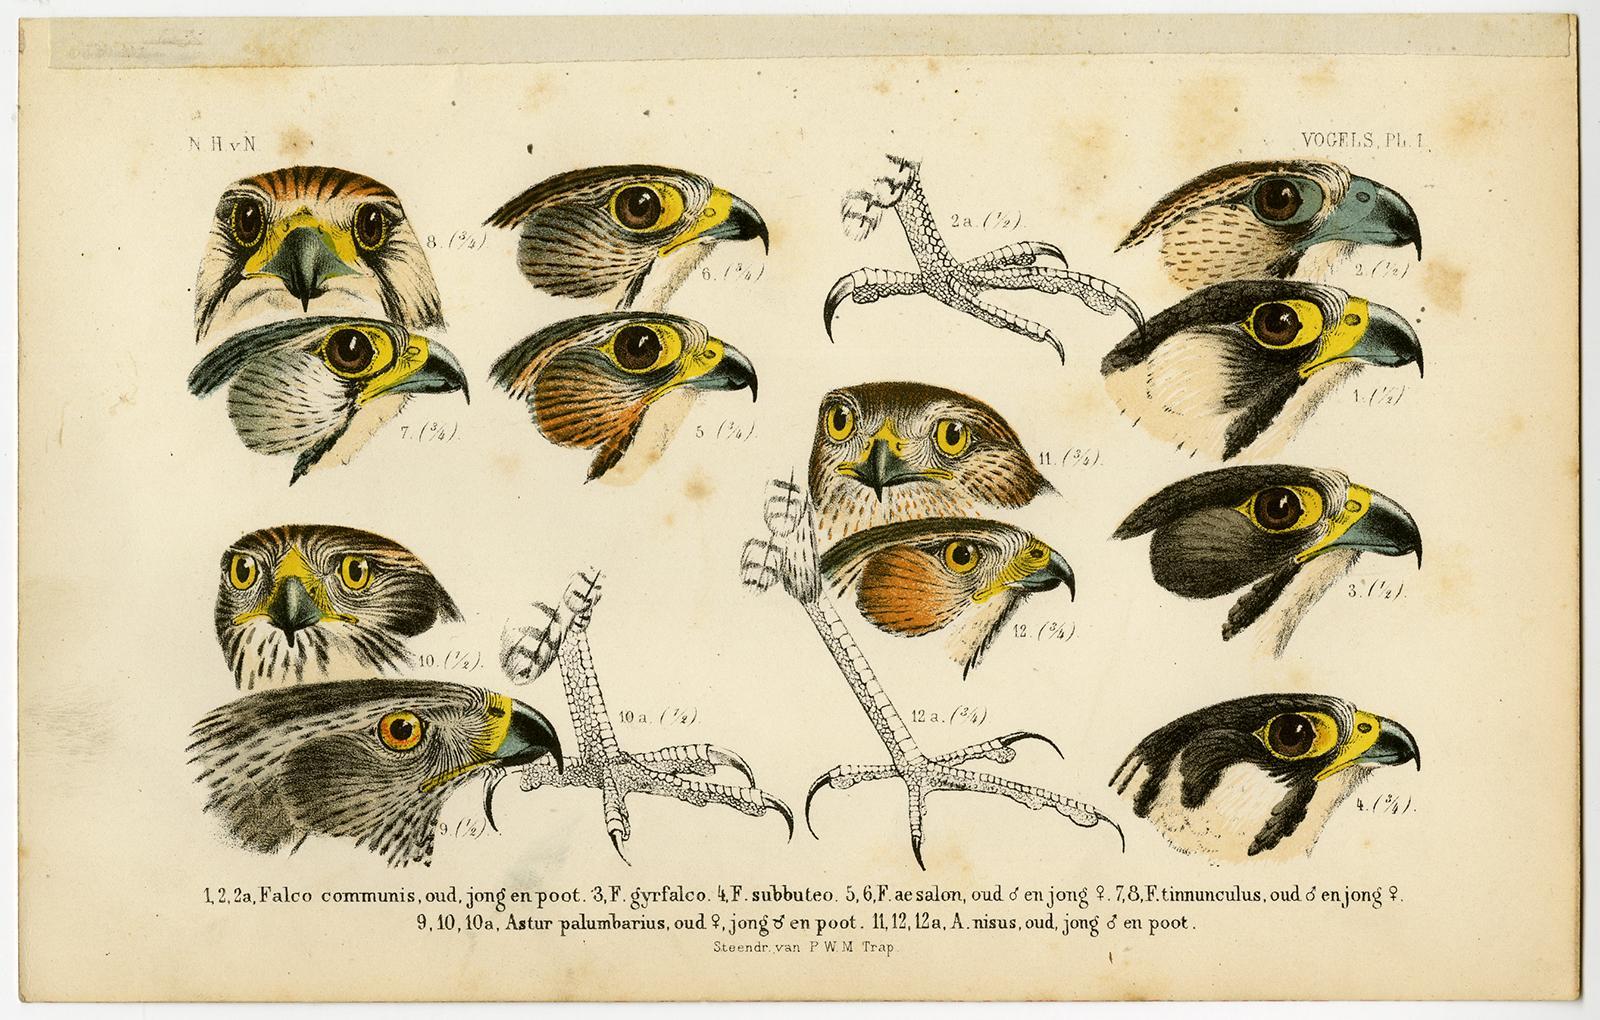 Antique Print-BIRDS OF PREY-FALCON-HAWK-KITE-PL. 1-Schlegel-1878